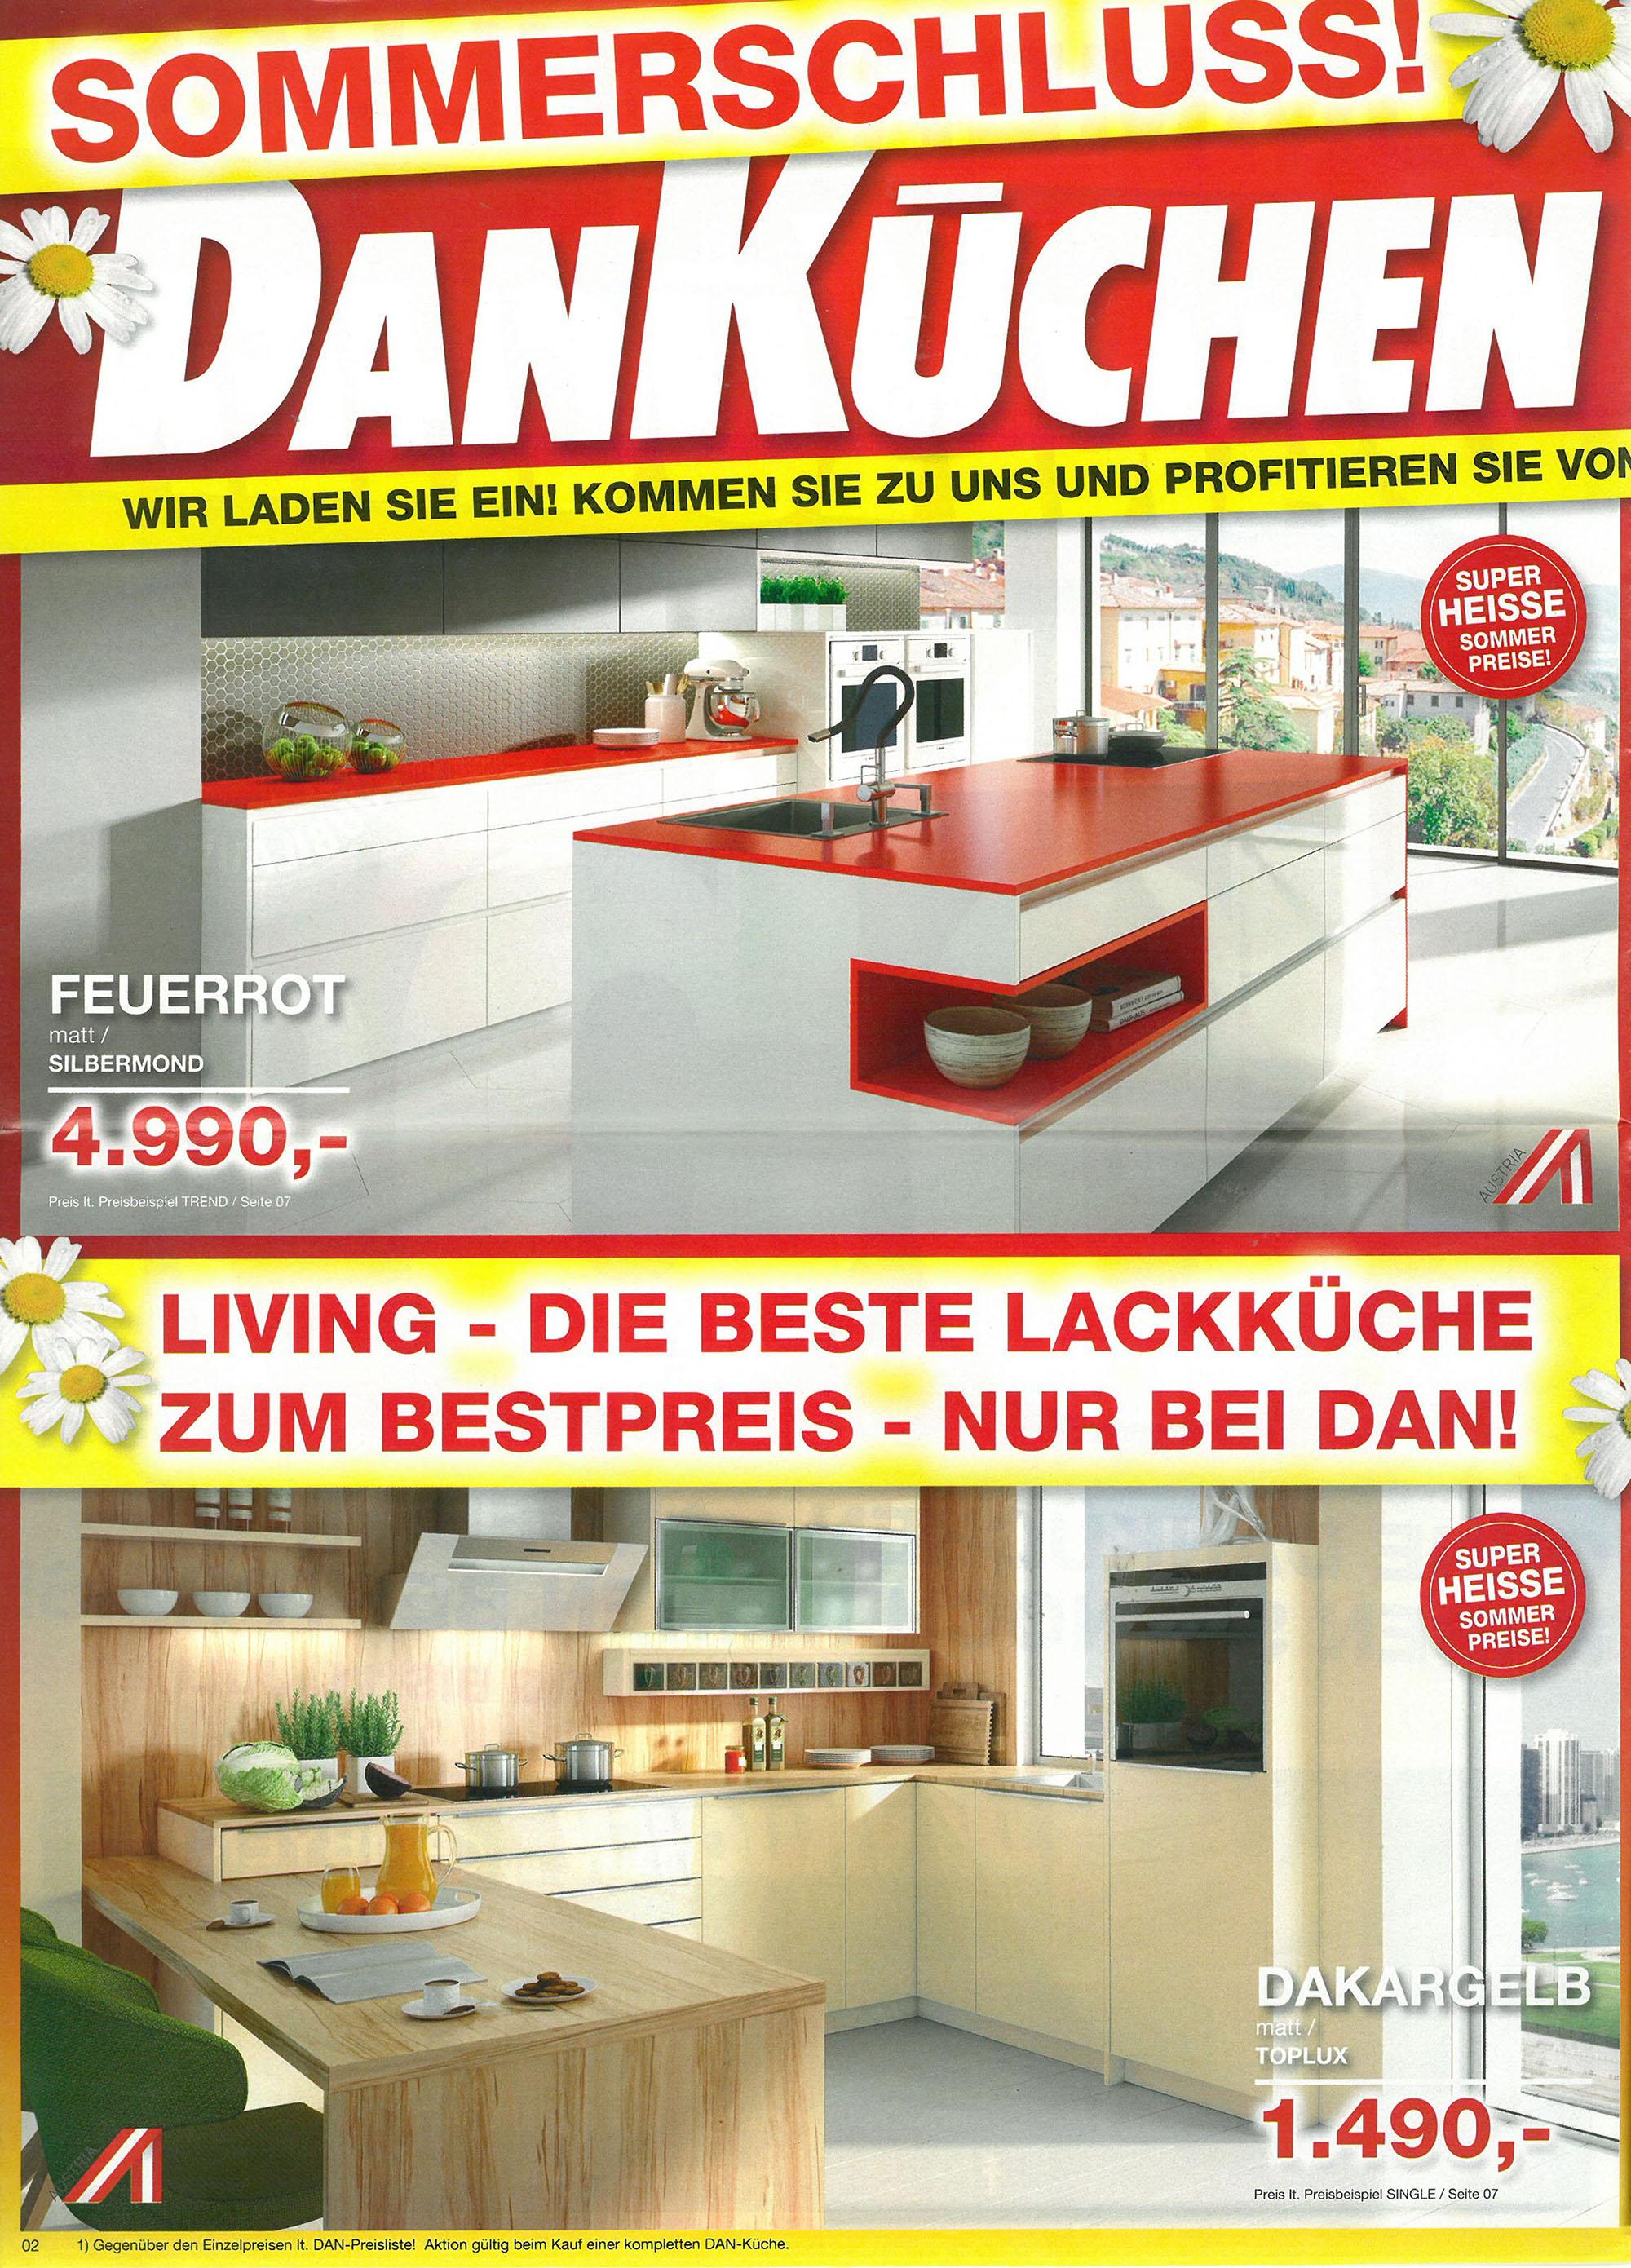 55% Neuen Katalog von DanKüchen - Ambyenta   {Dan küchen katalog 46}